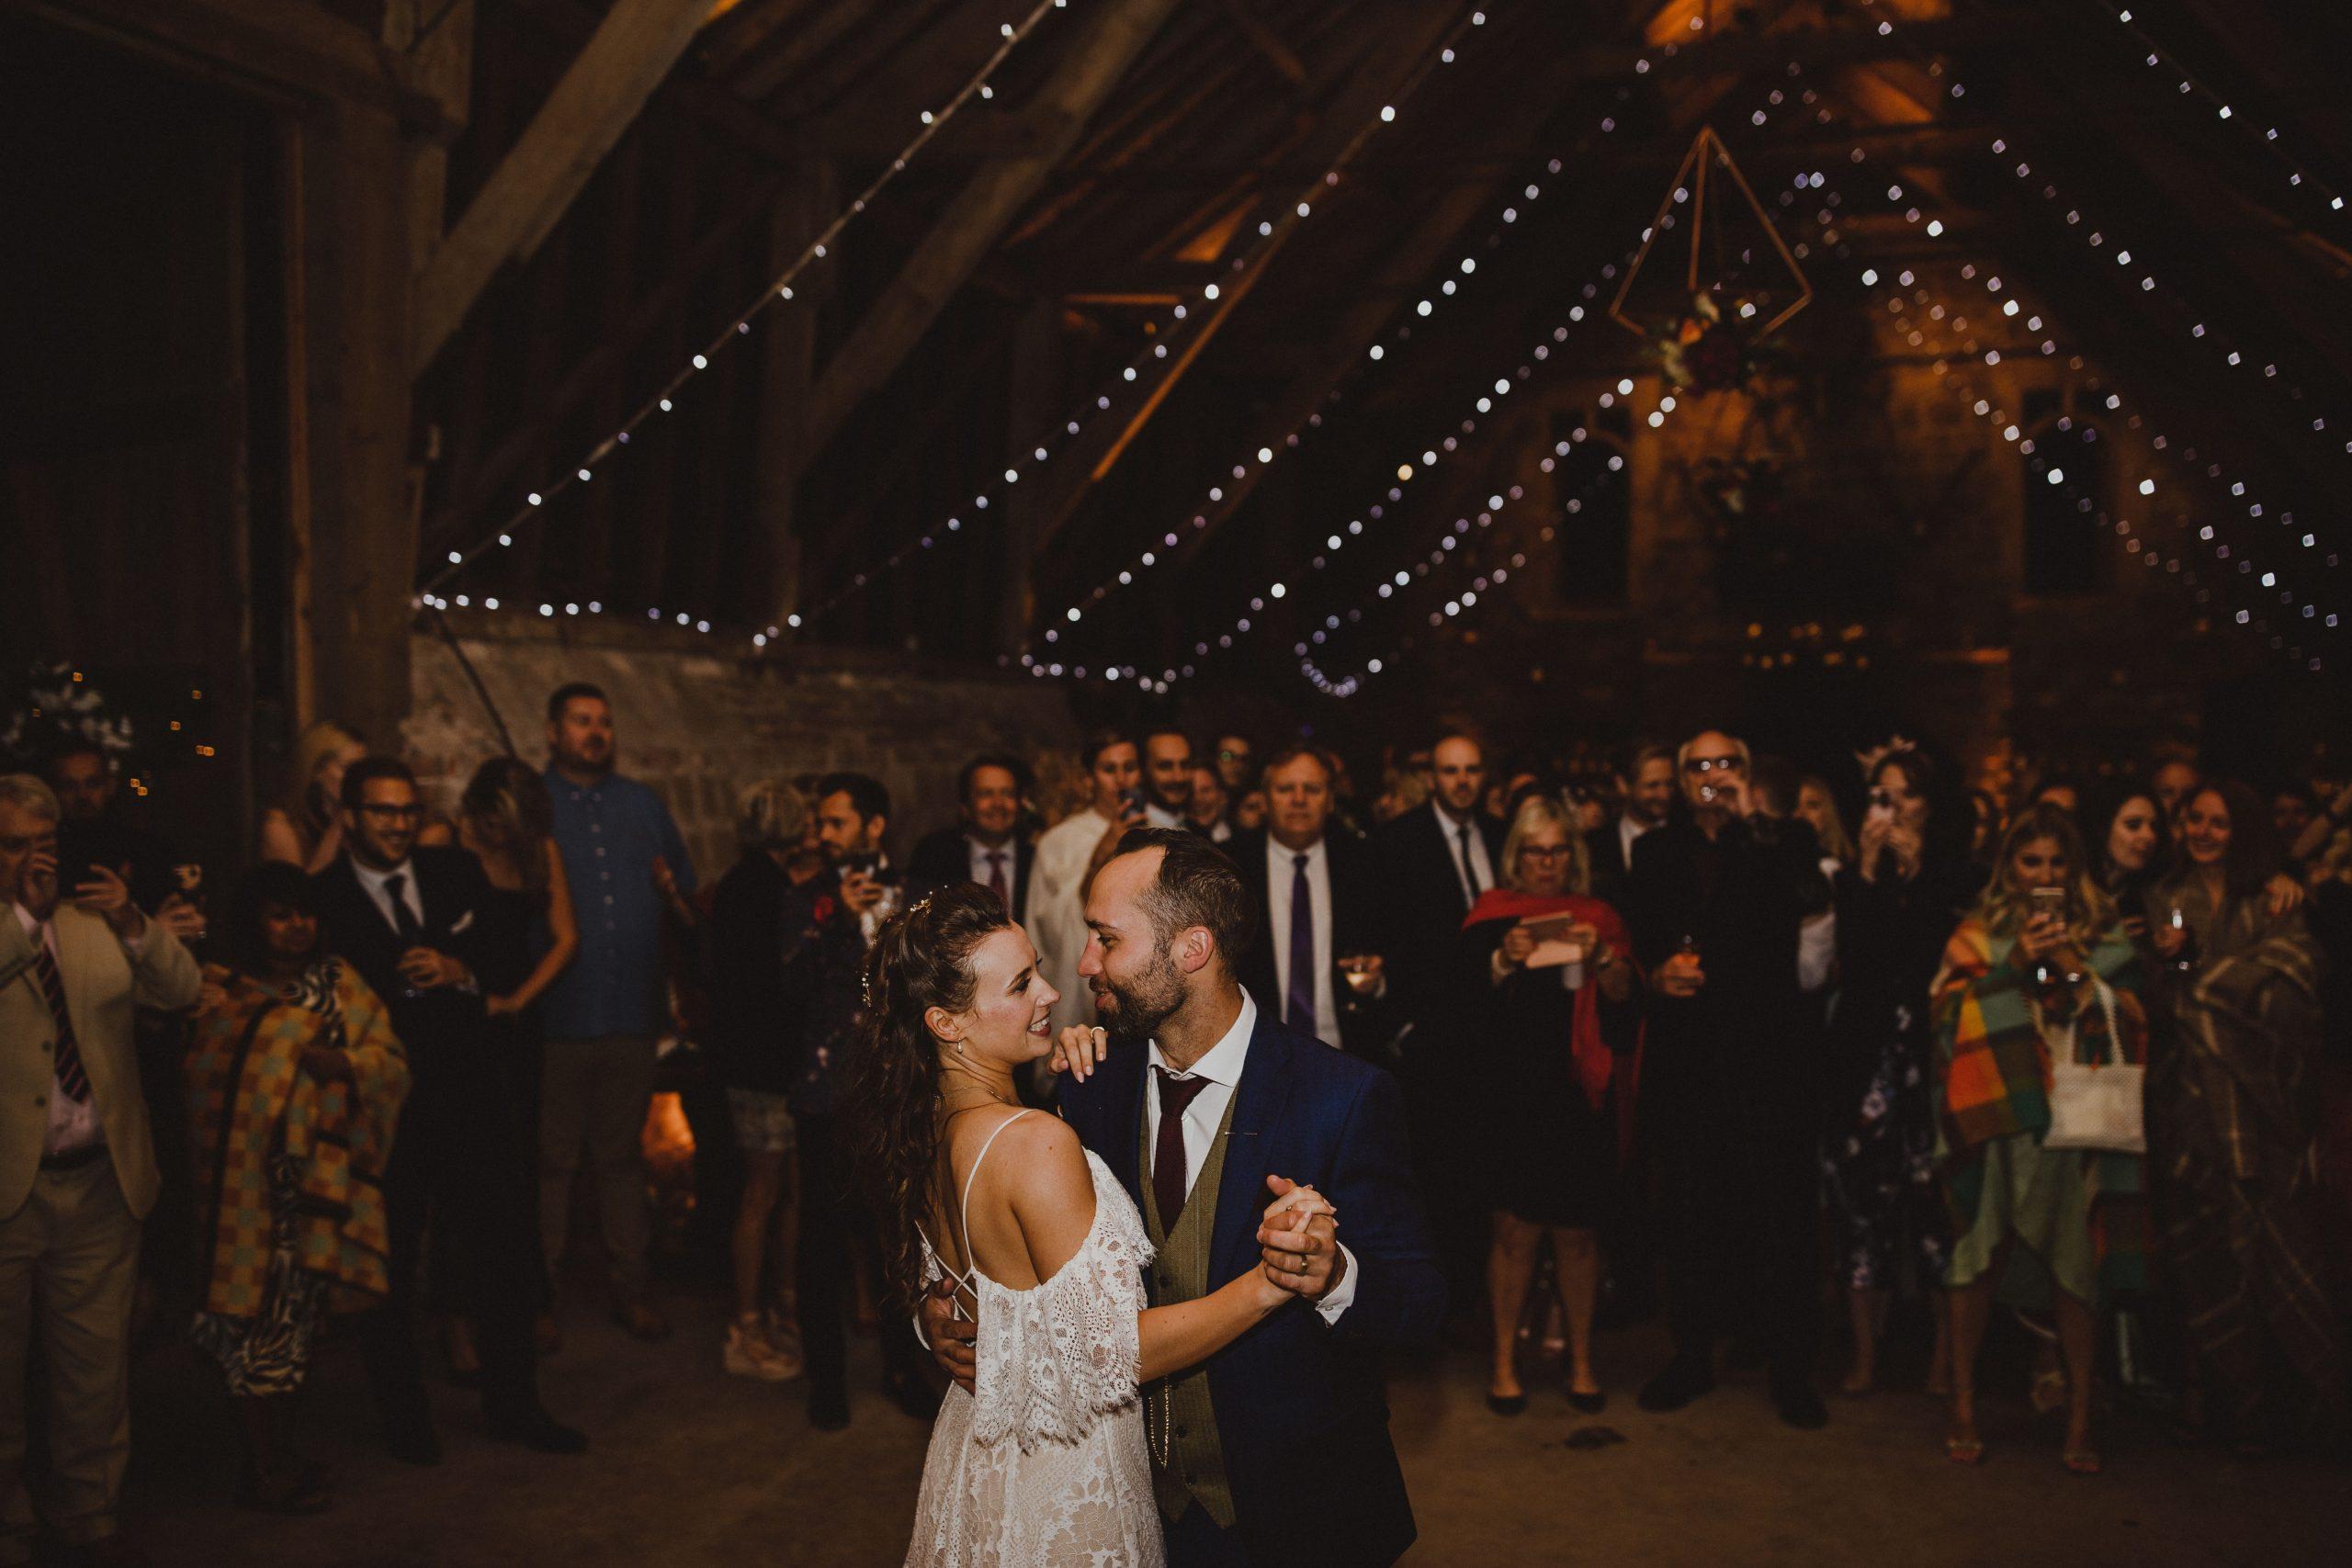 Wick Bottom Barn Tasha and Tom First Dance